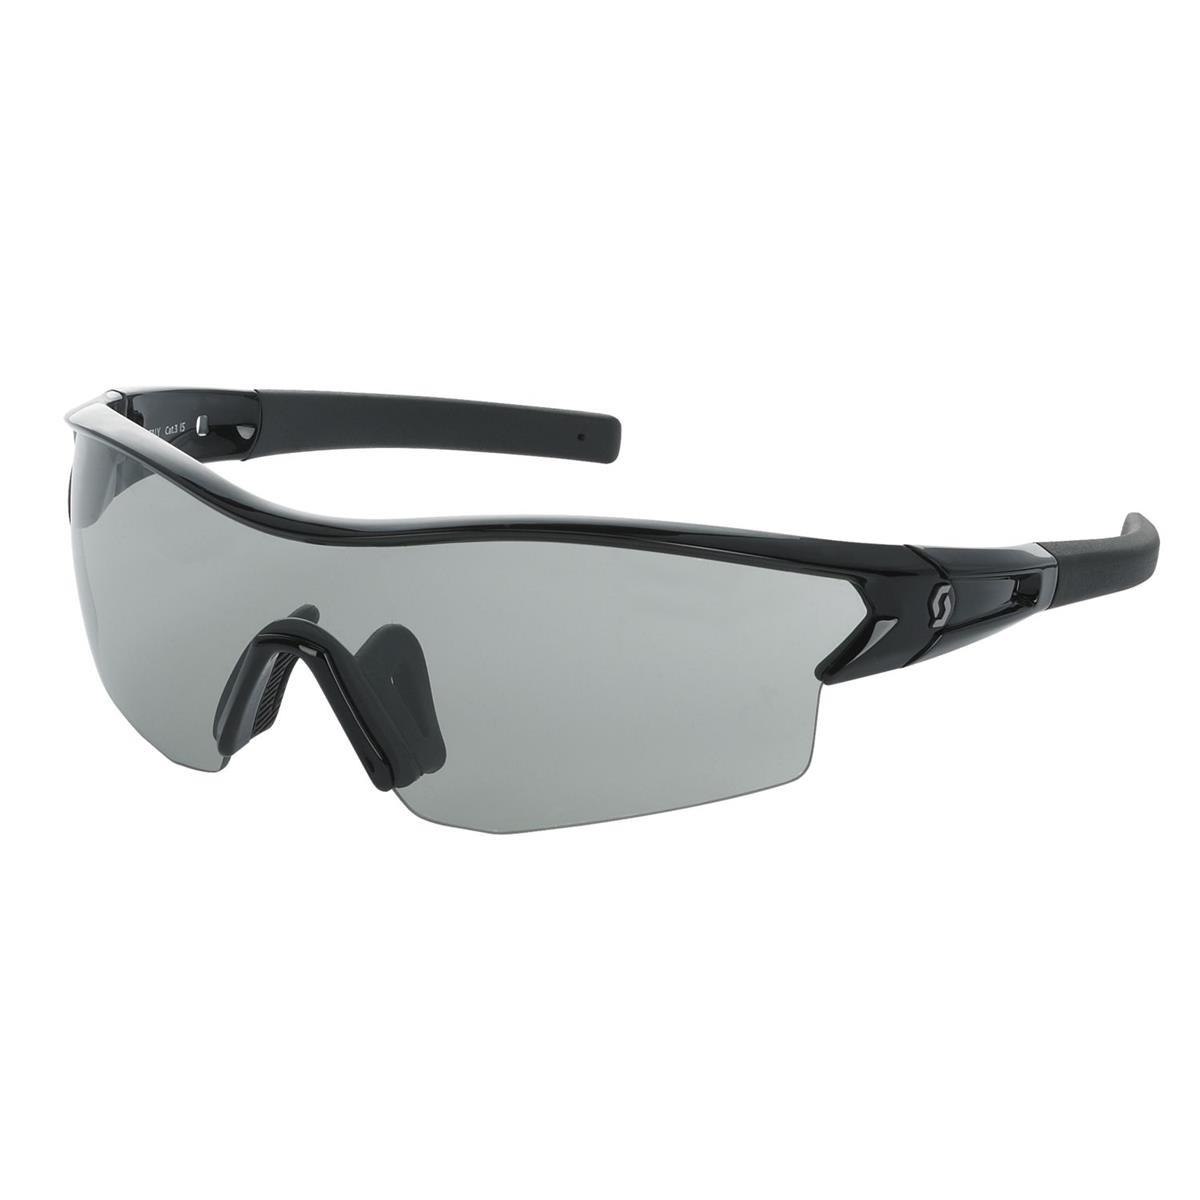 Scott Leap Sonnenbrille black glossy grey + clear LmpQRyd81s